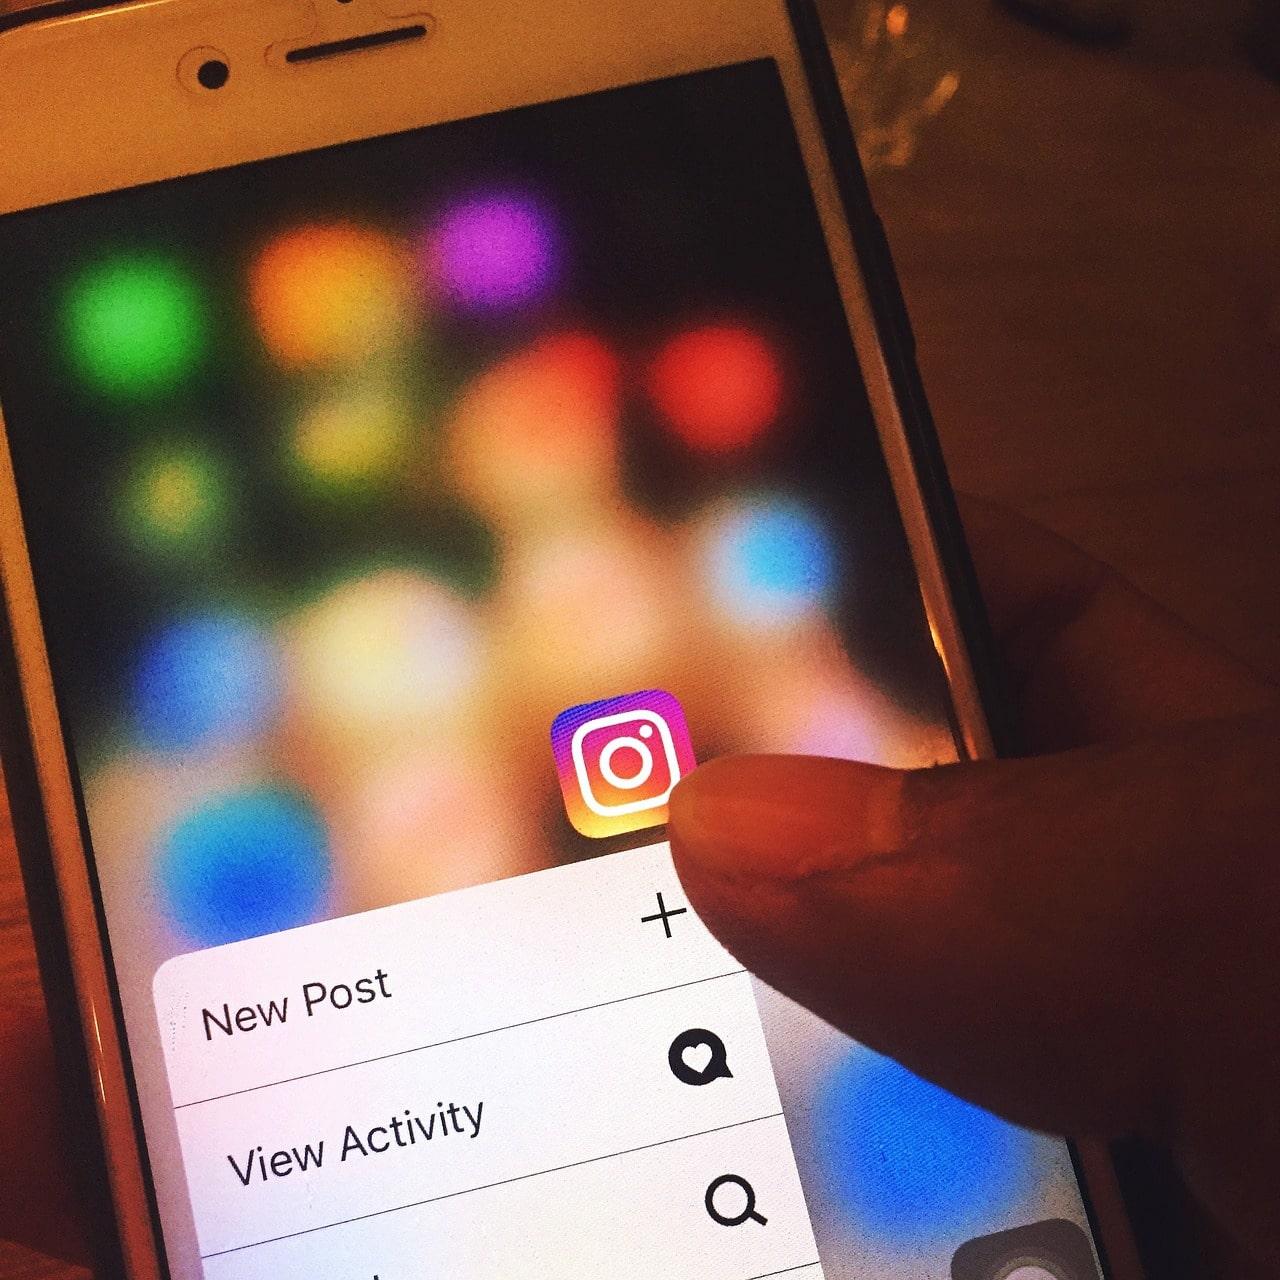 Instagram「フォロー中」タブ廃止!ゴシップ用のストーカーツールだった?